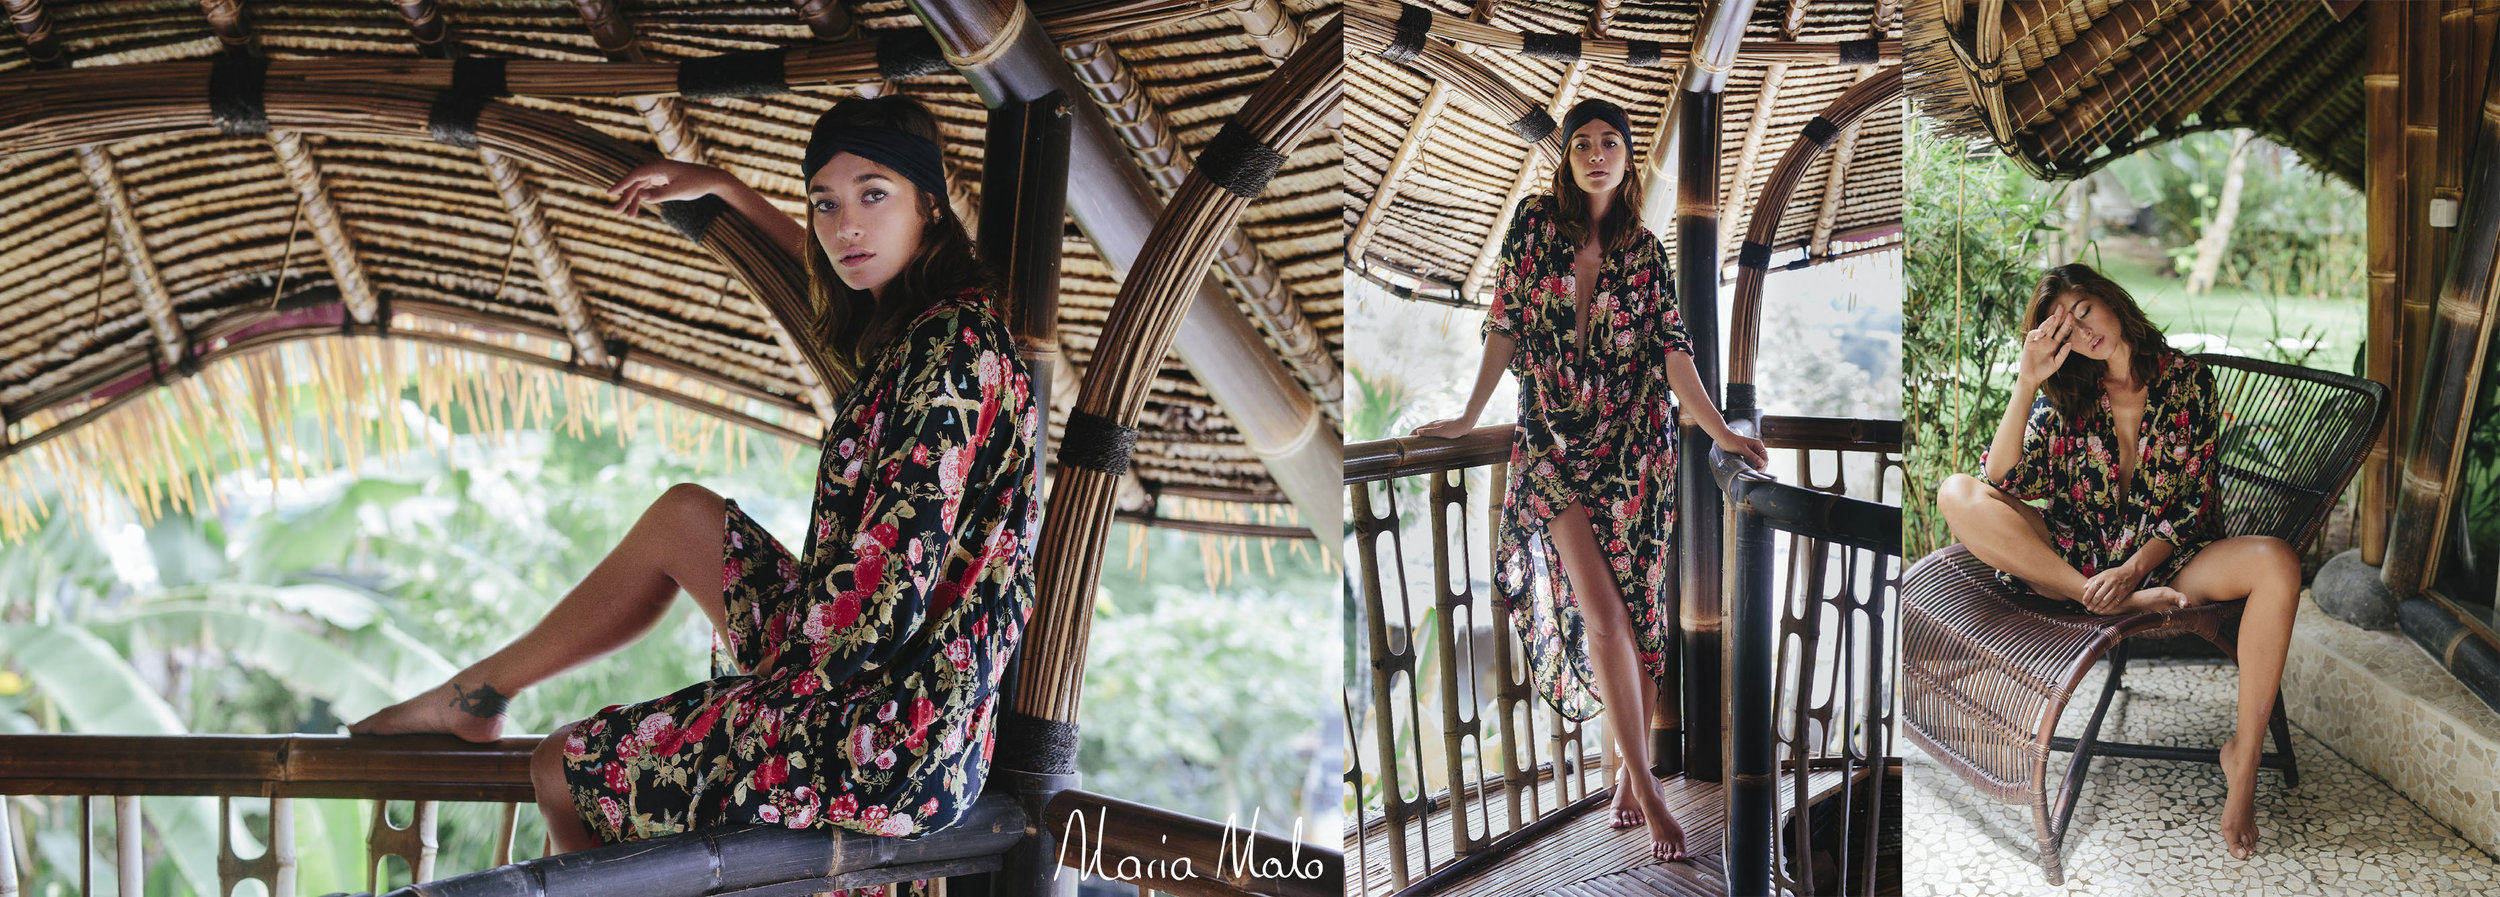 Maria Malo Summer Collection 2017